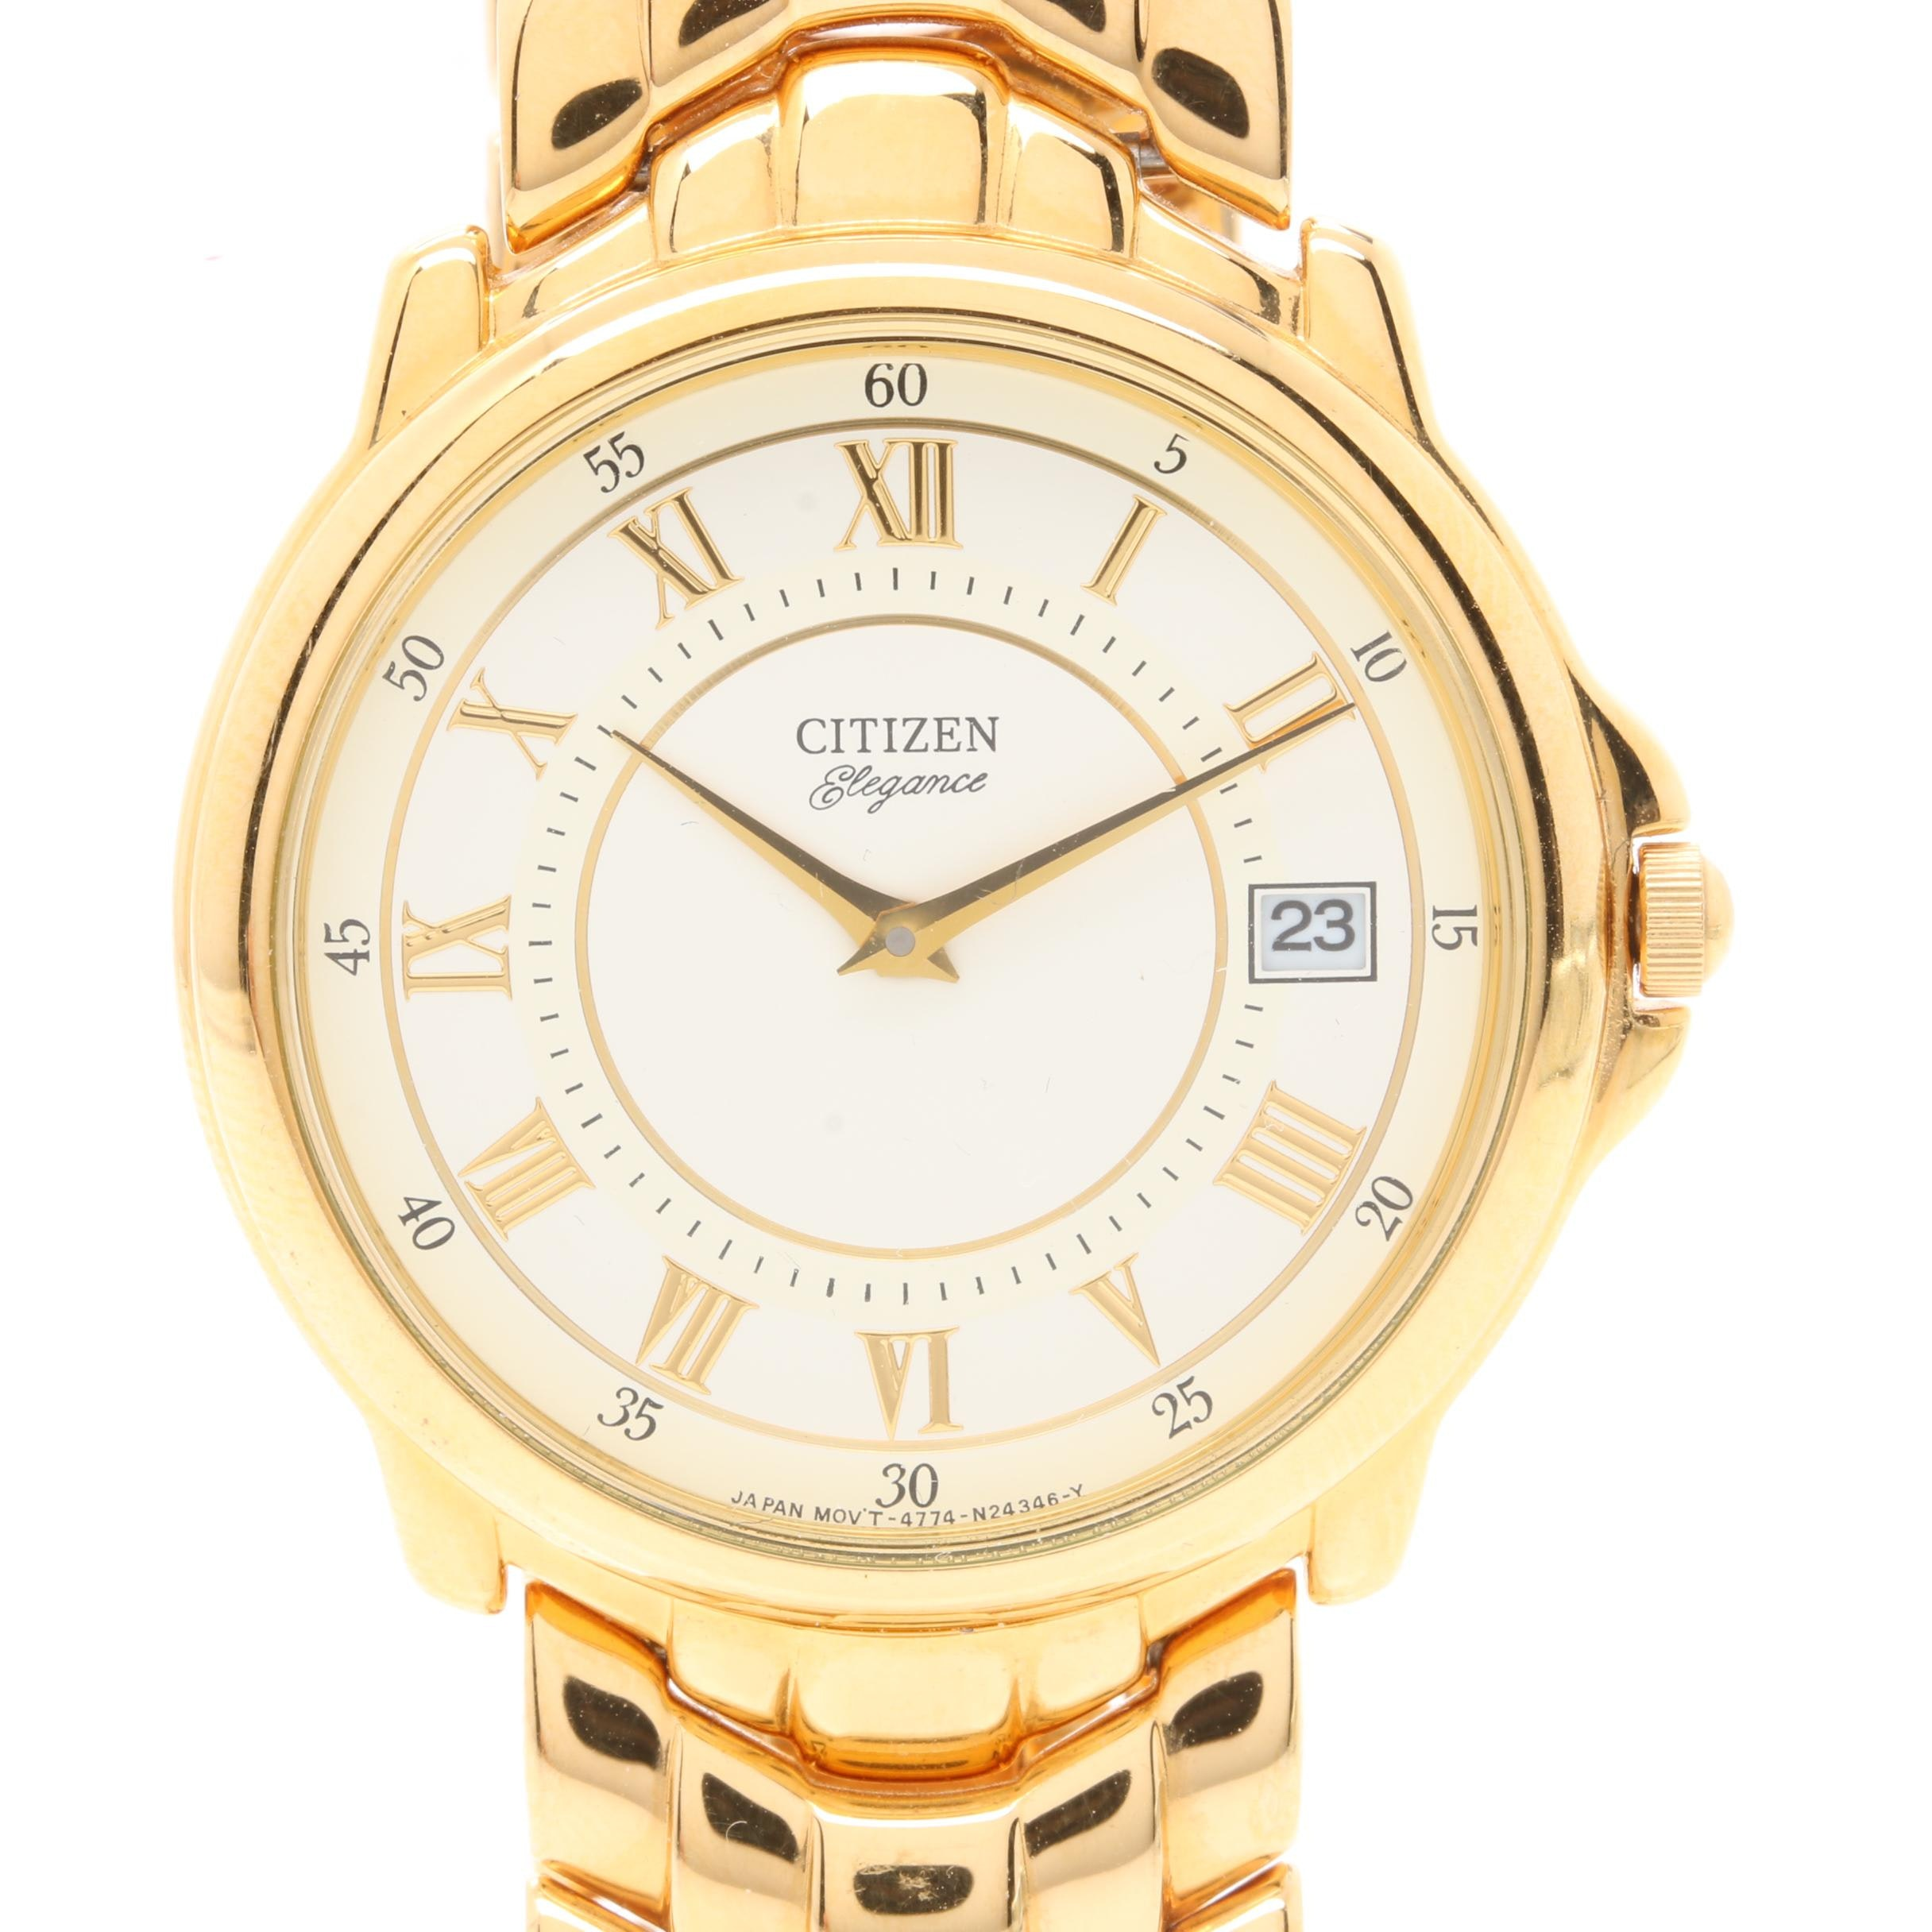 Citizen Elegance Gold Tone Dress Wristwatch with Box